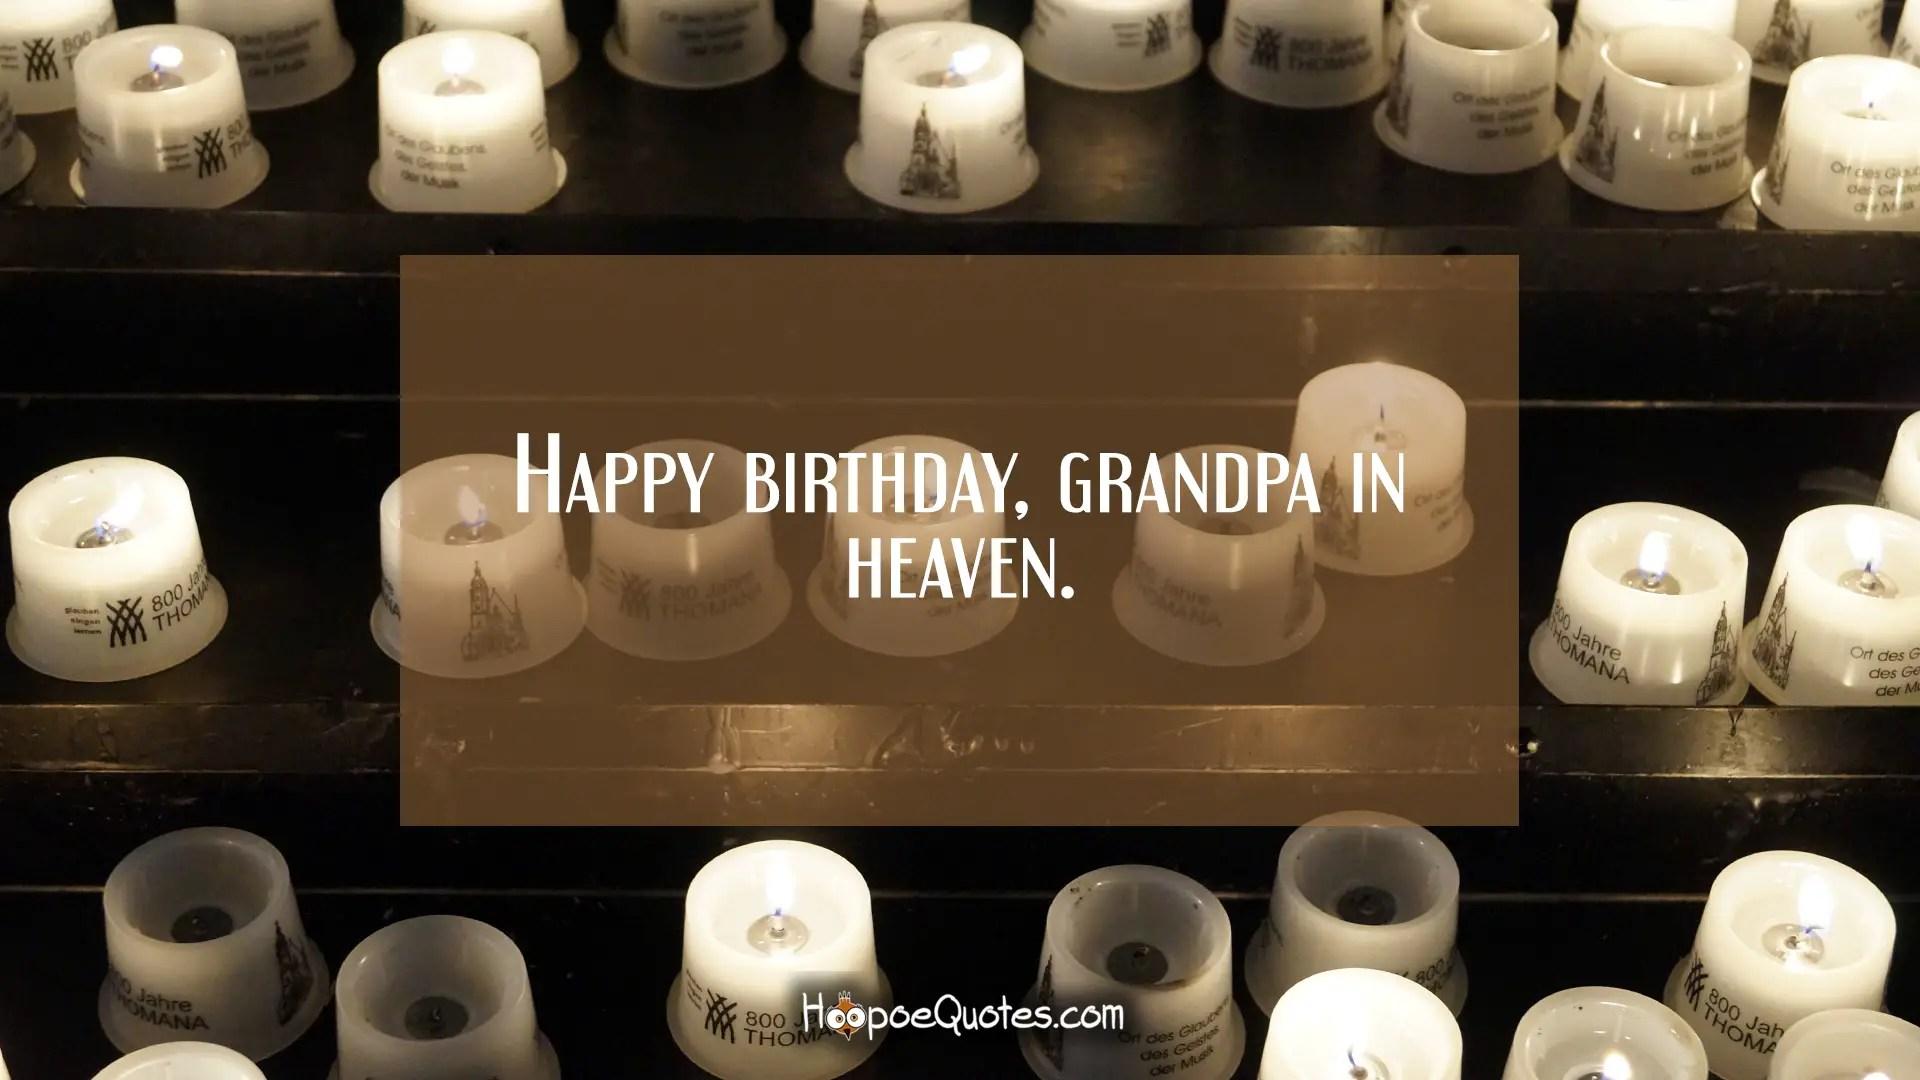 Happy Birthday Grandpa In Heaven Hoopoequotes